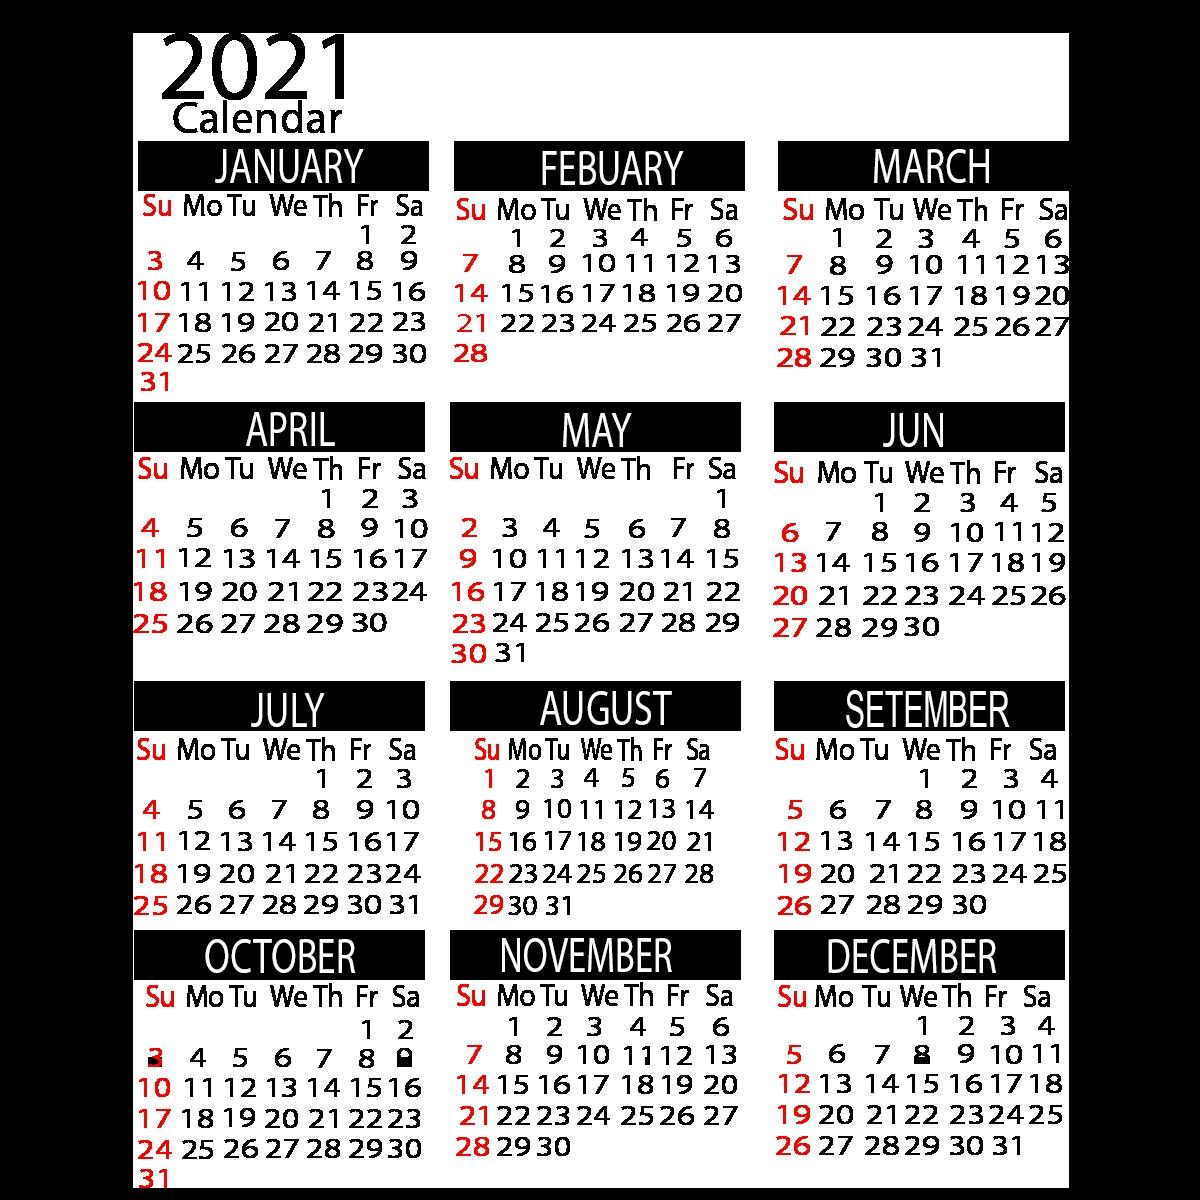 2021 yearly calendar printable calendar ::Downloadable 2021 Calendar with Holidays